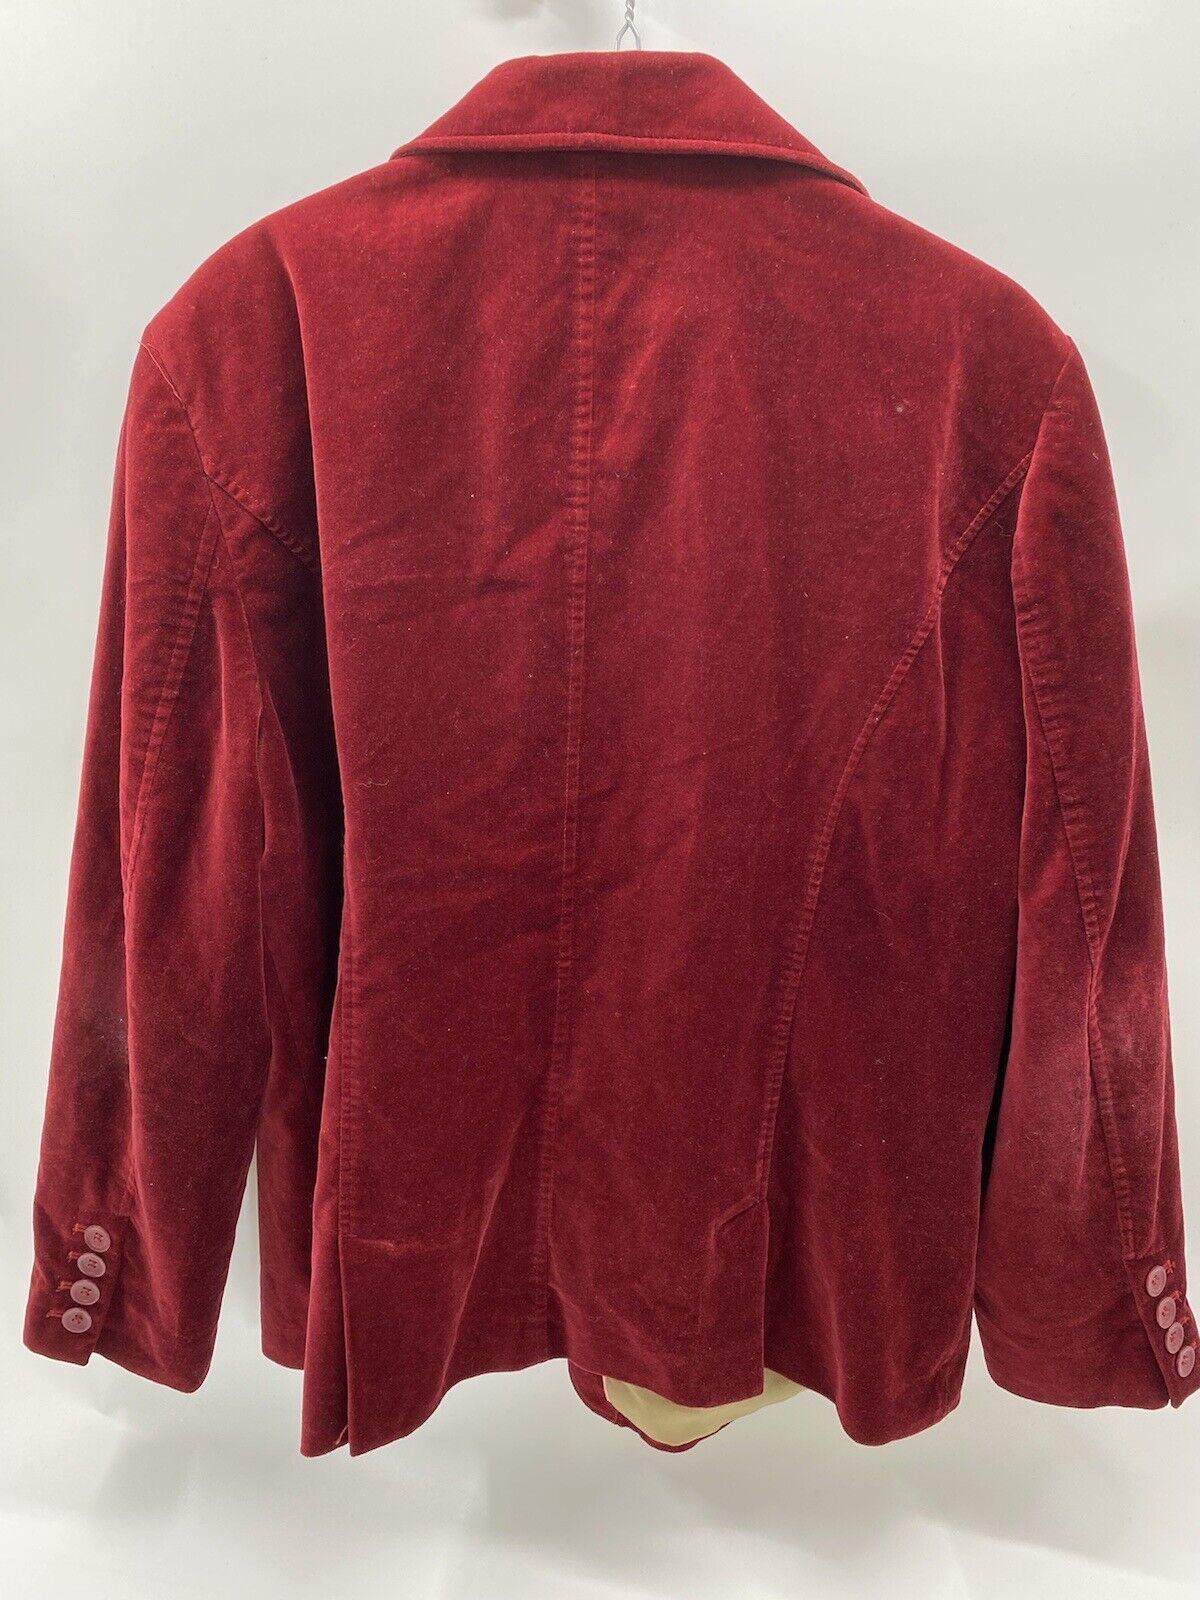 Liz Claiborne Red suede lined jacket/blazer Mediu… - image 2